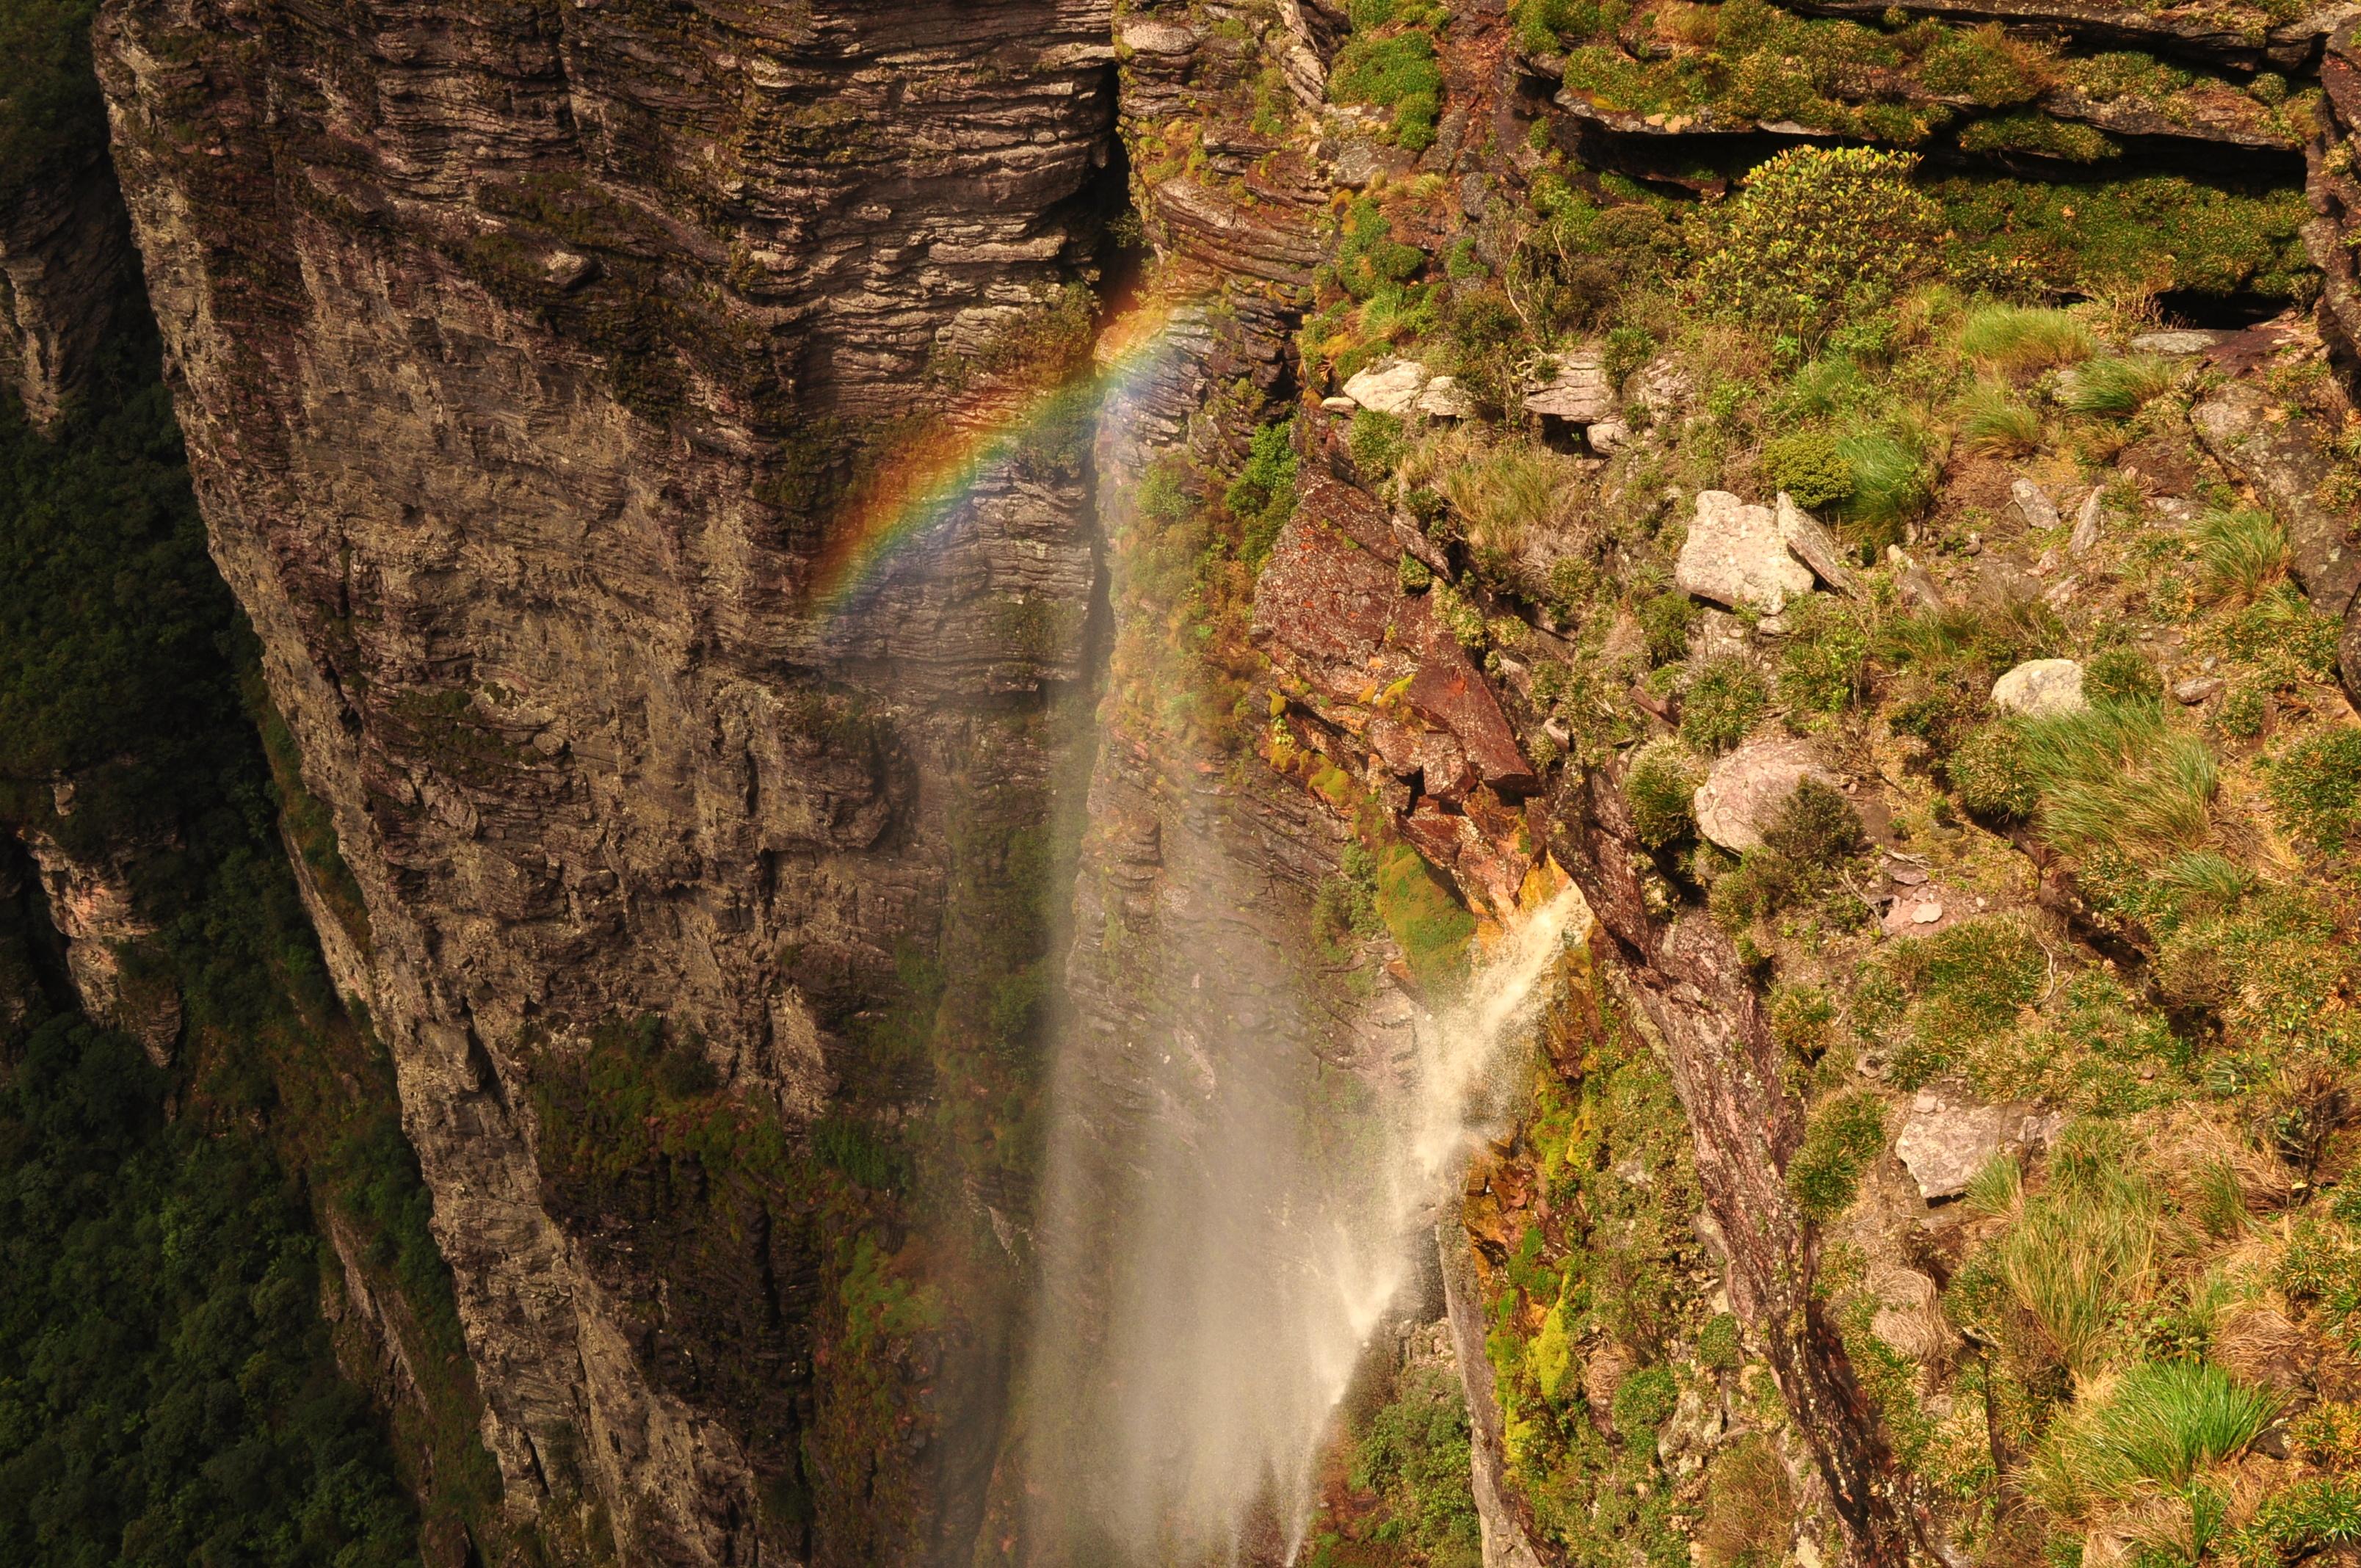 Waterfall Smoke (Fumaça Waterfall)